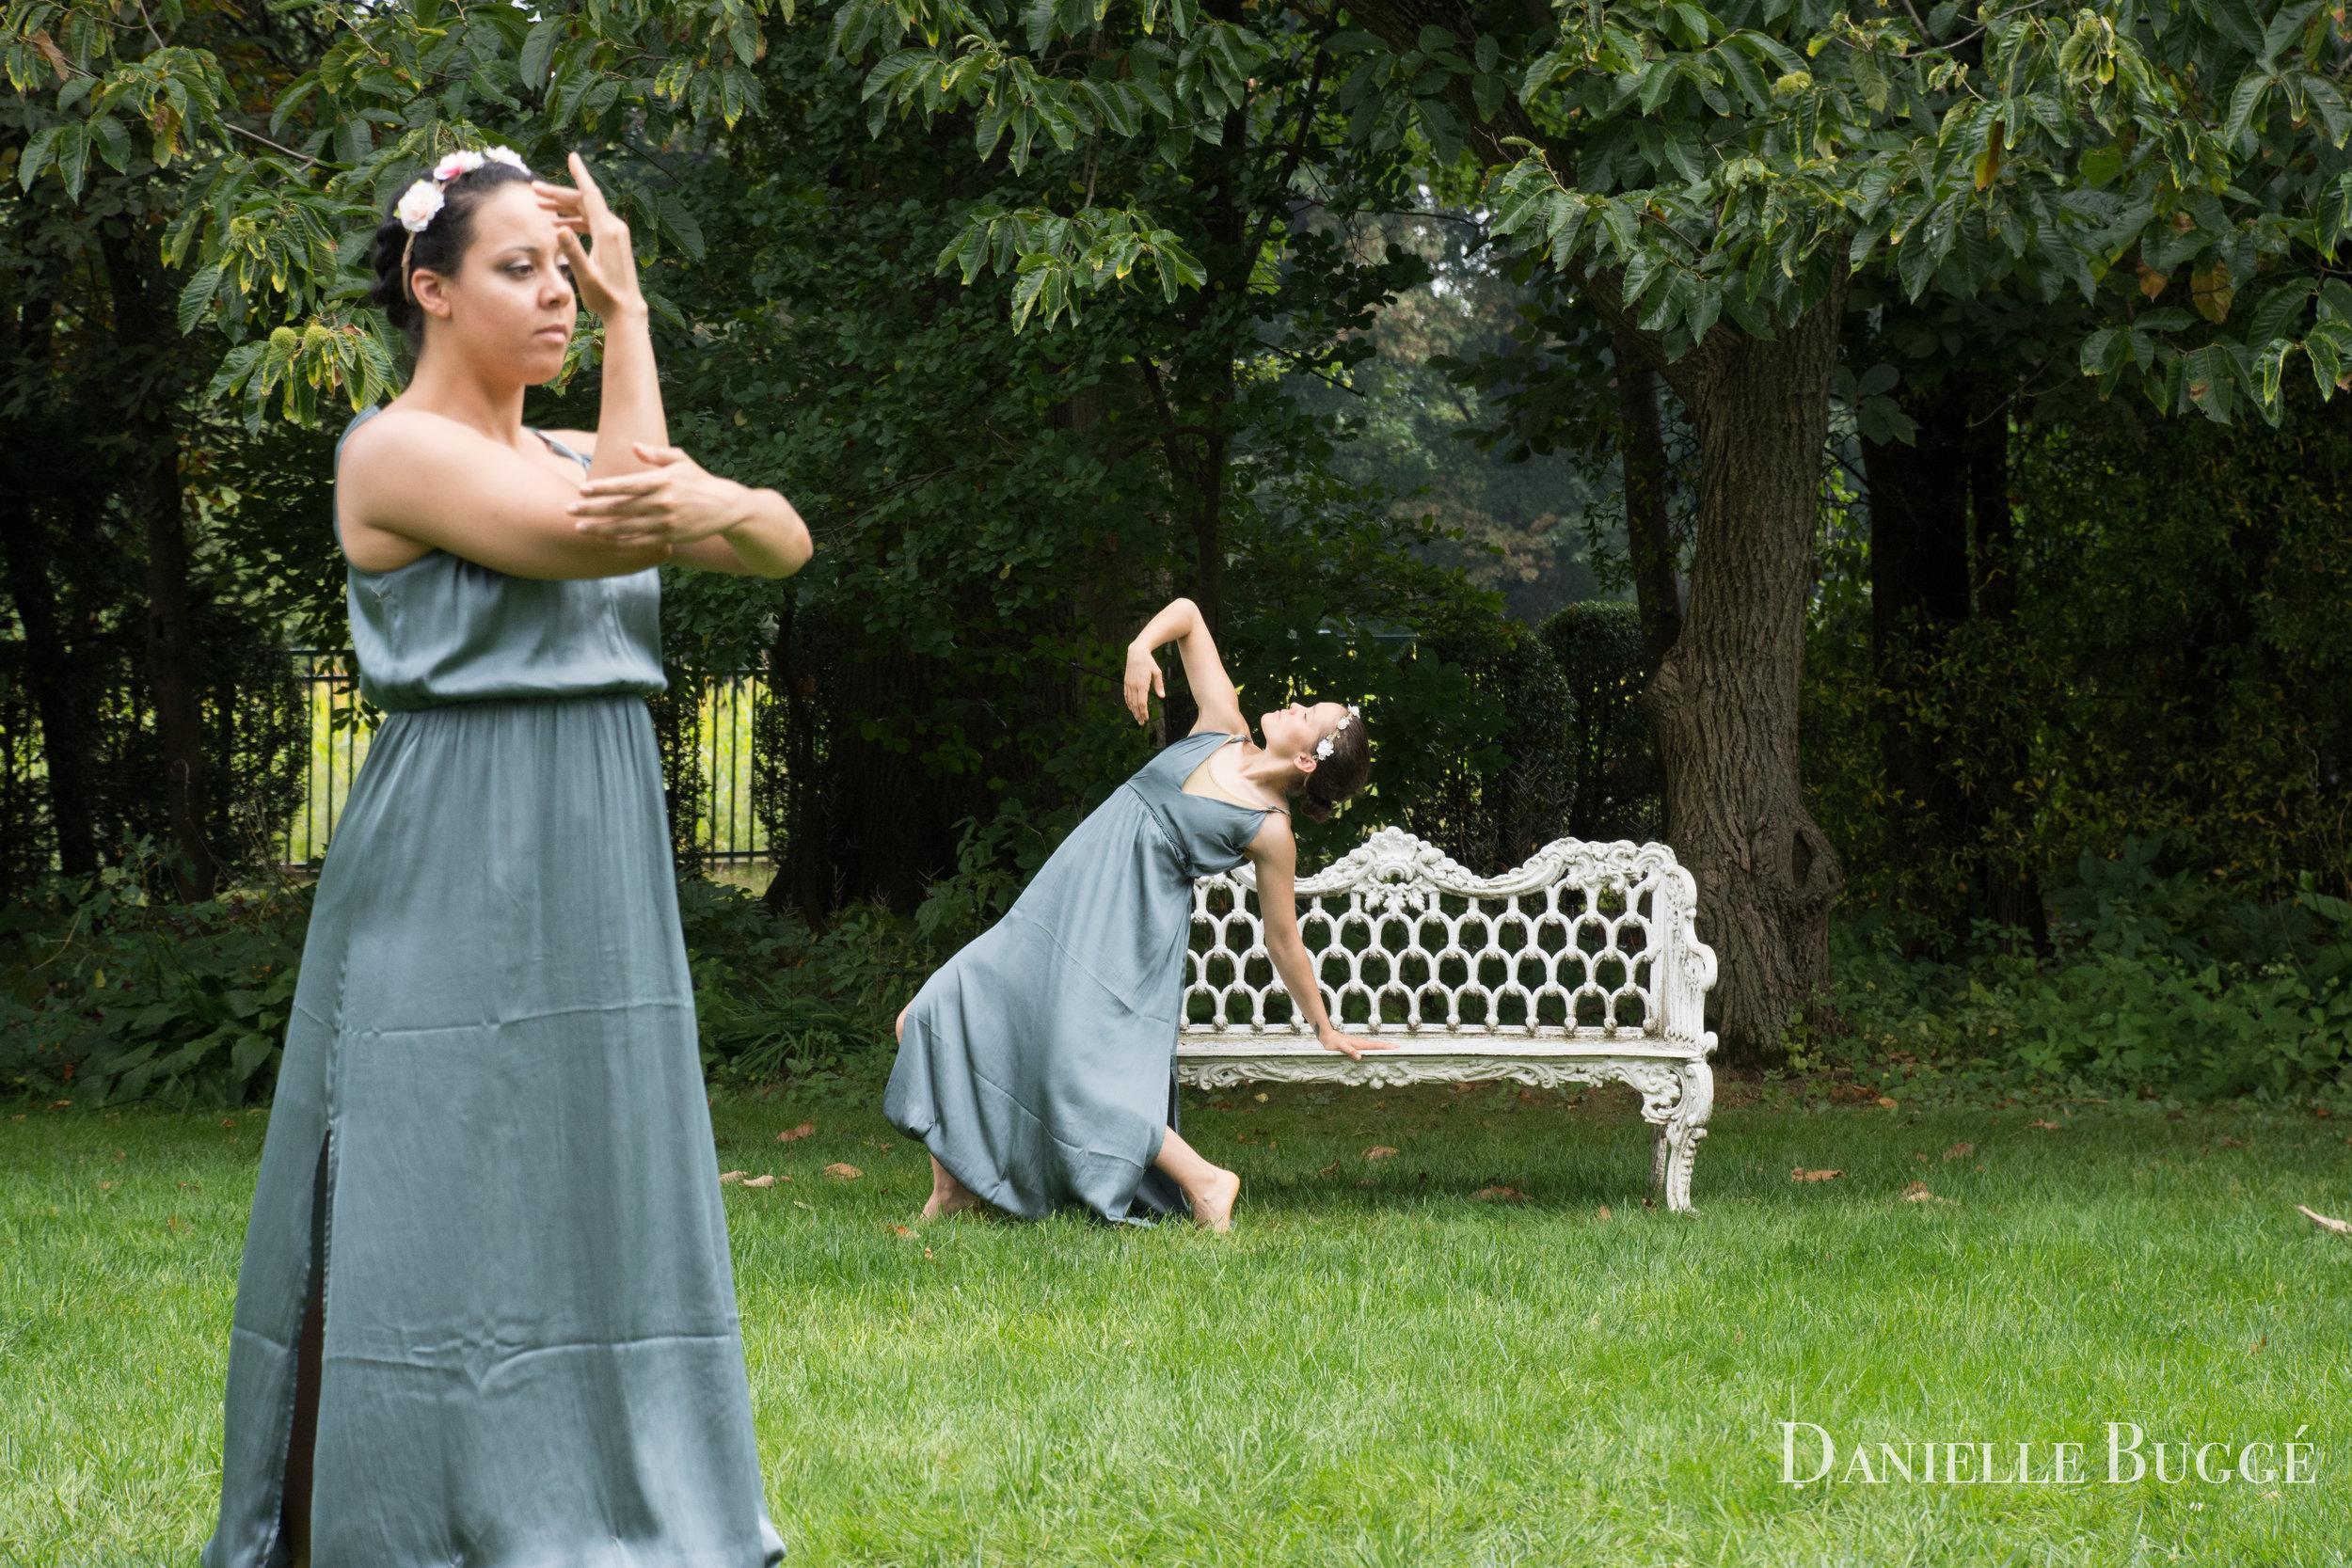 Humanistics Dance Company. Photography by Danielle Buggé